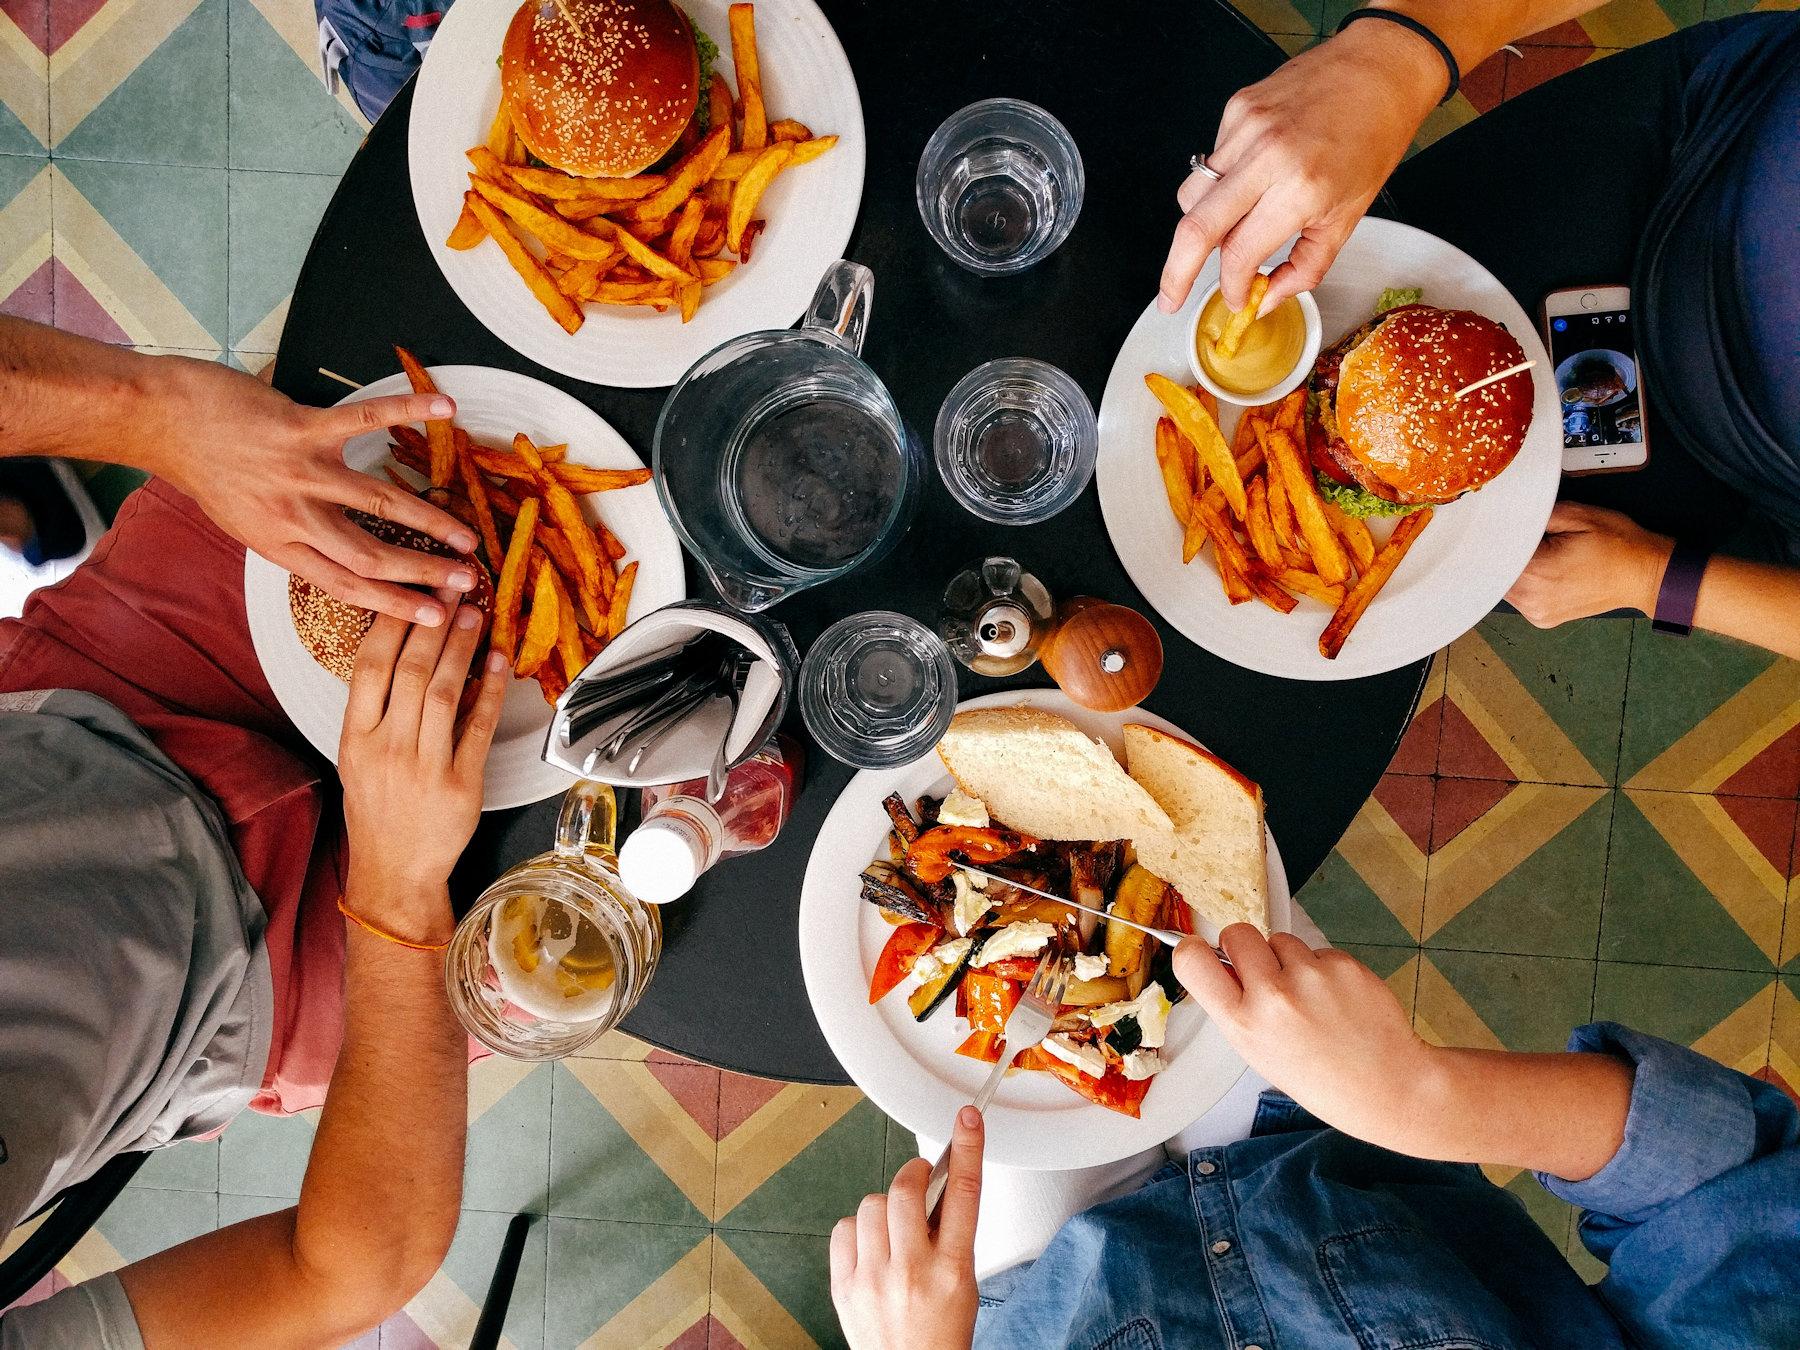 Restaurant Incentive Ideas for Taking Surveys